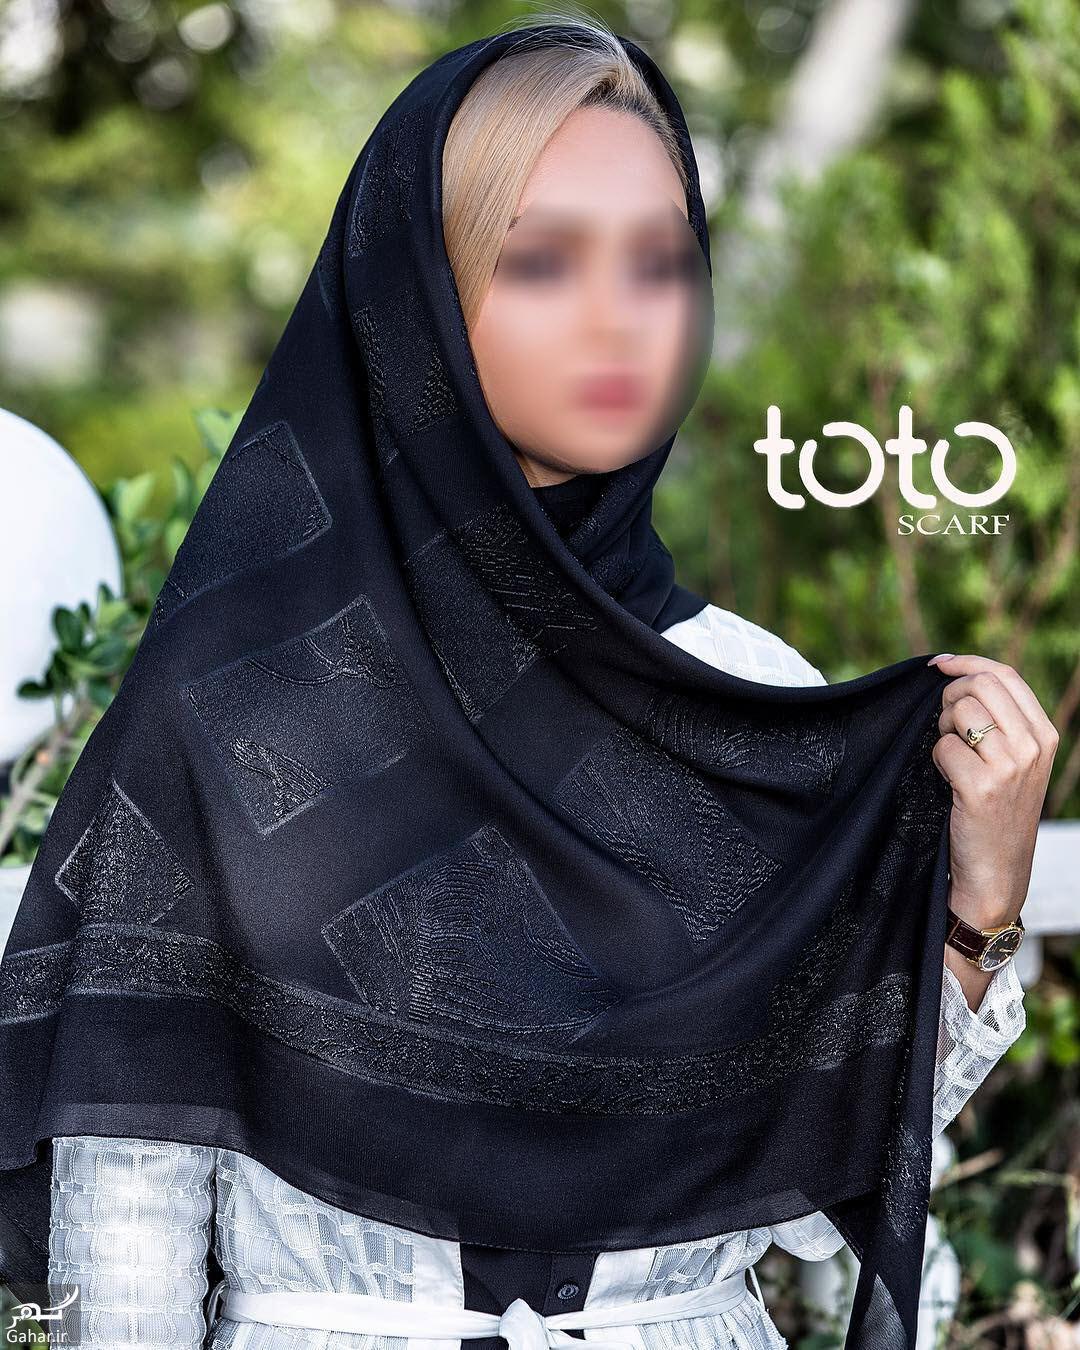 424796 Gahar ir جدیدترین مدل های شال و روسری از برند ایرانی توتو